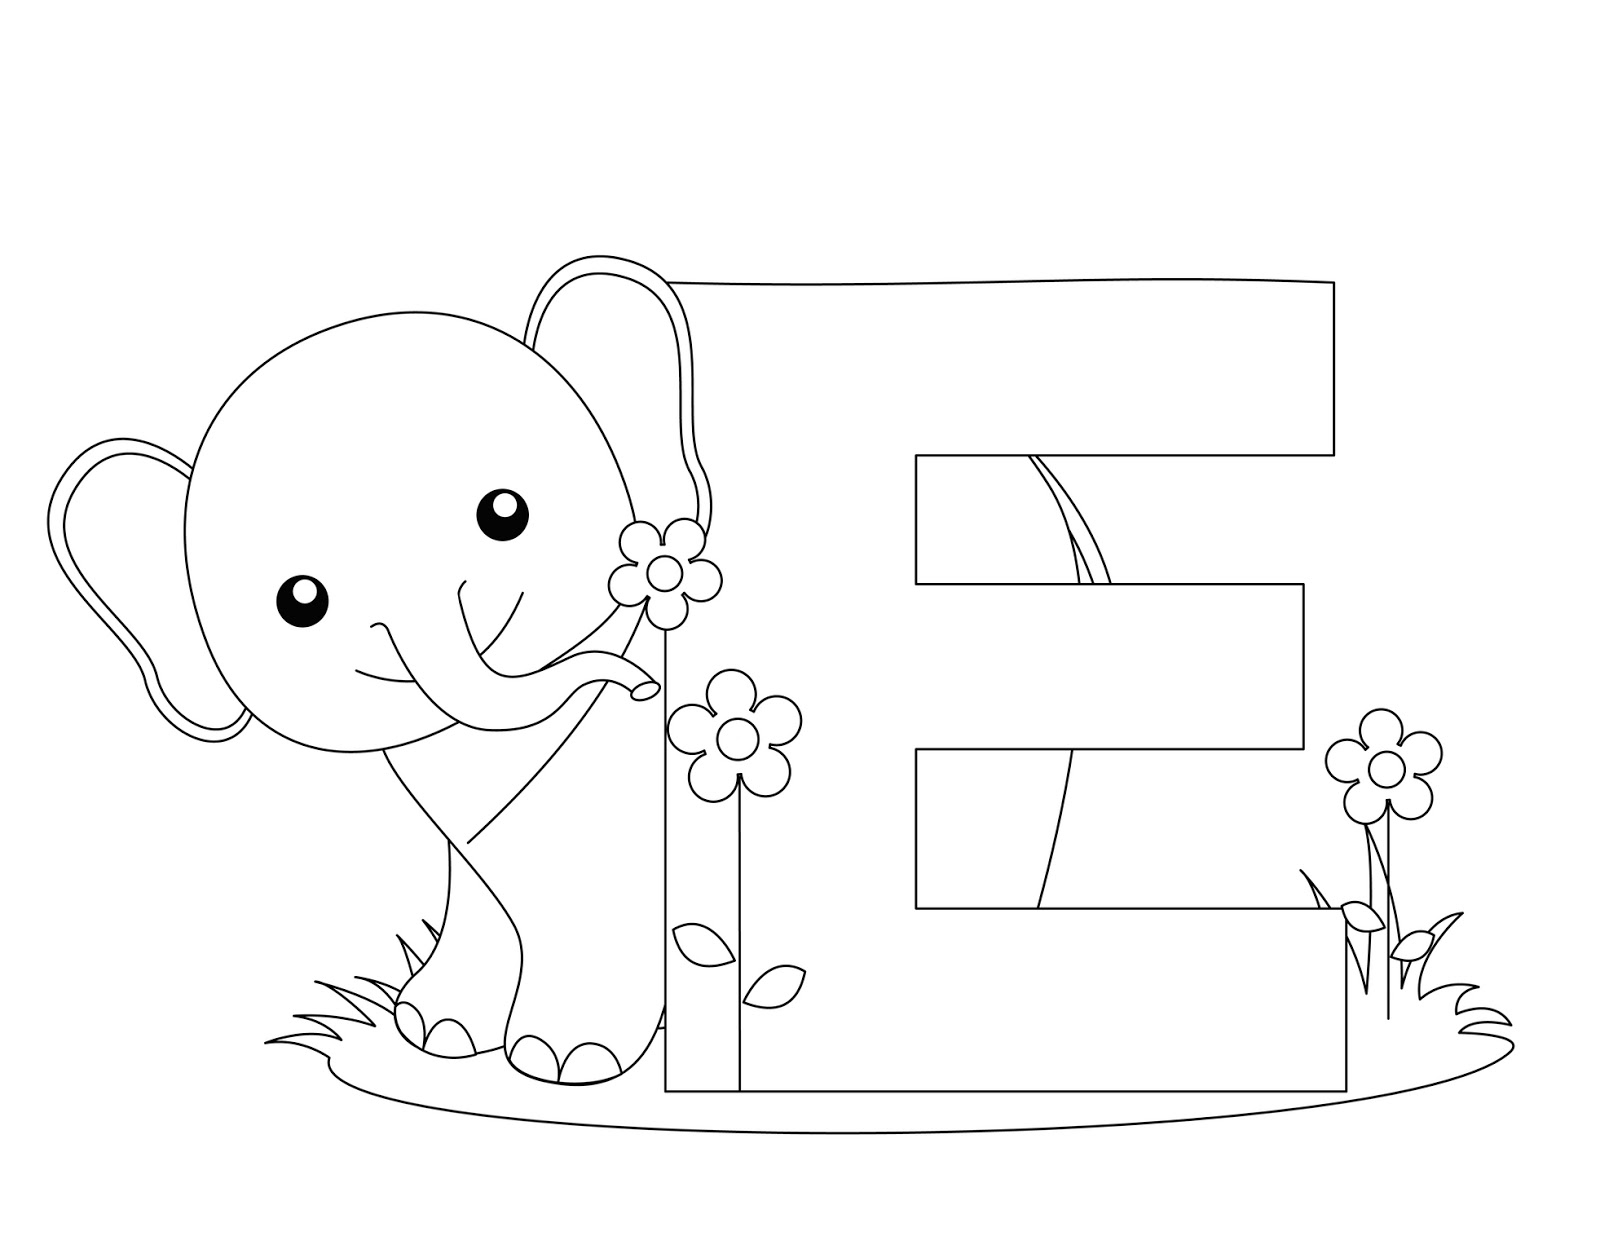 animal alphabet colouring pages printable letter j worksheets for kindergarten loving animal alphabet pages colouring